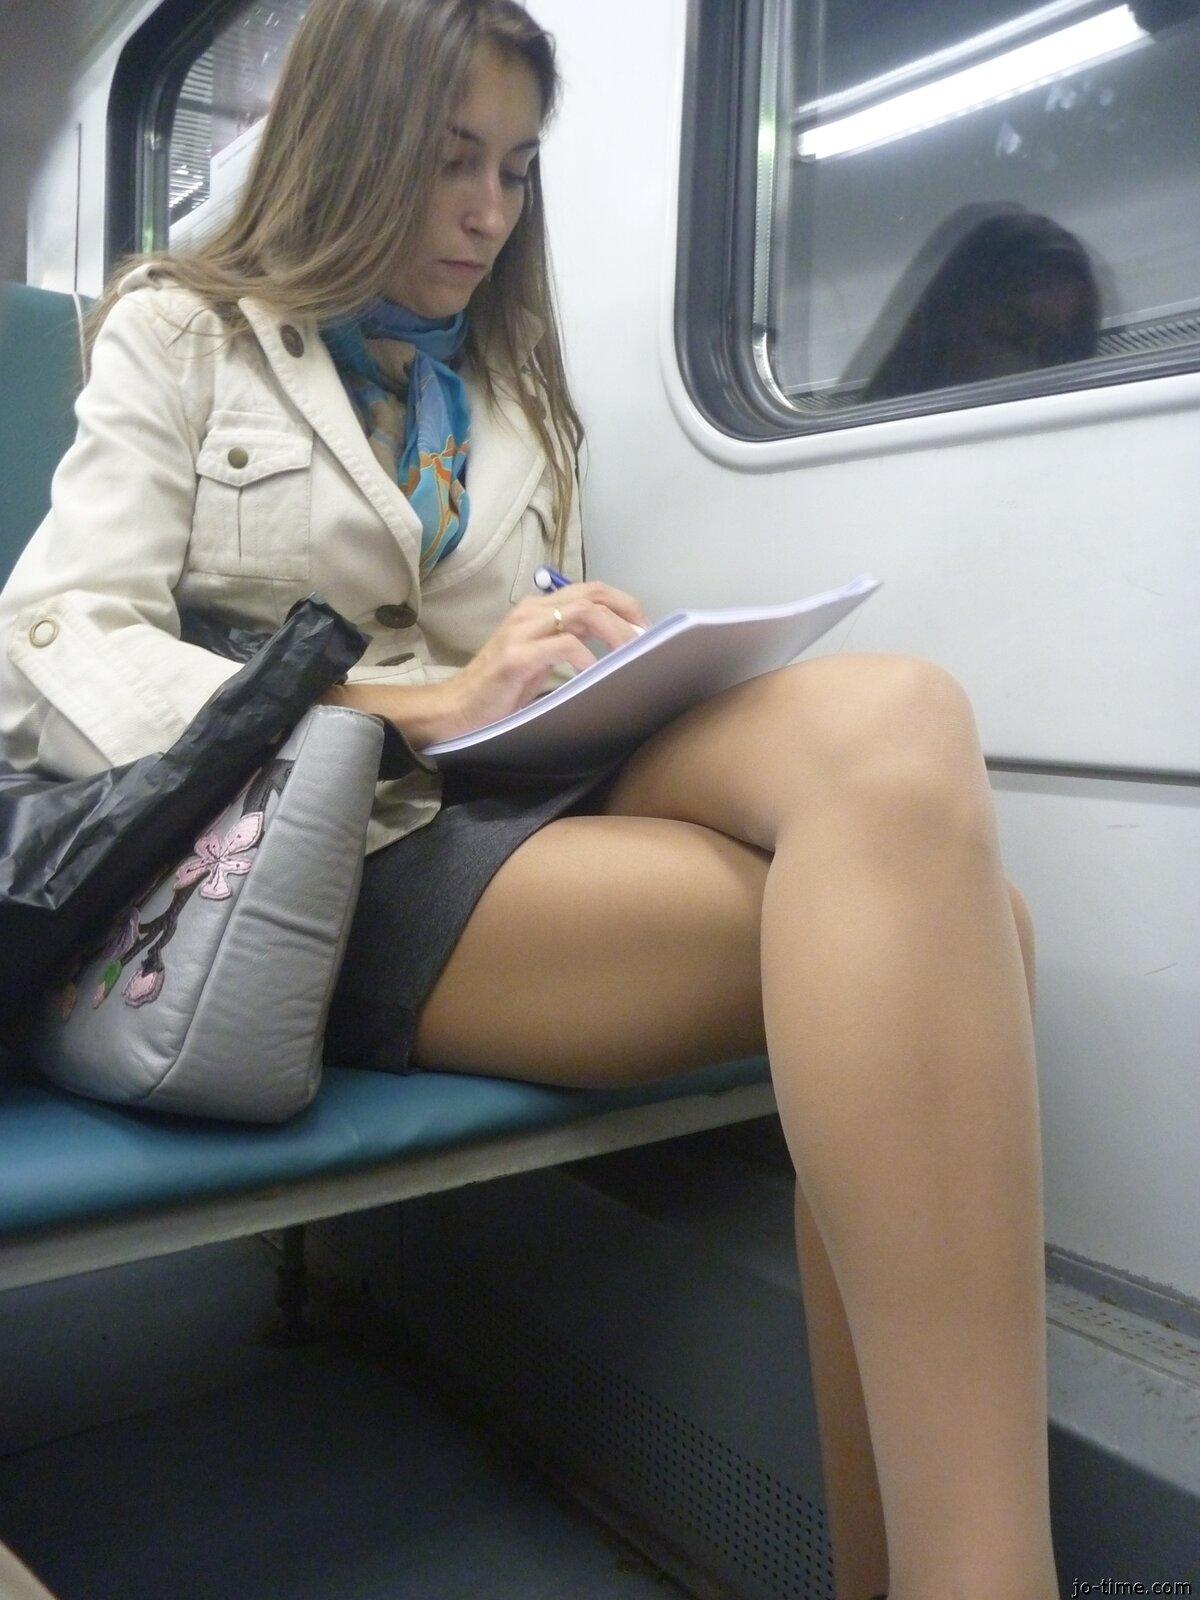 видео девушки в транспорте - 5